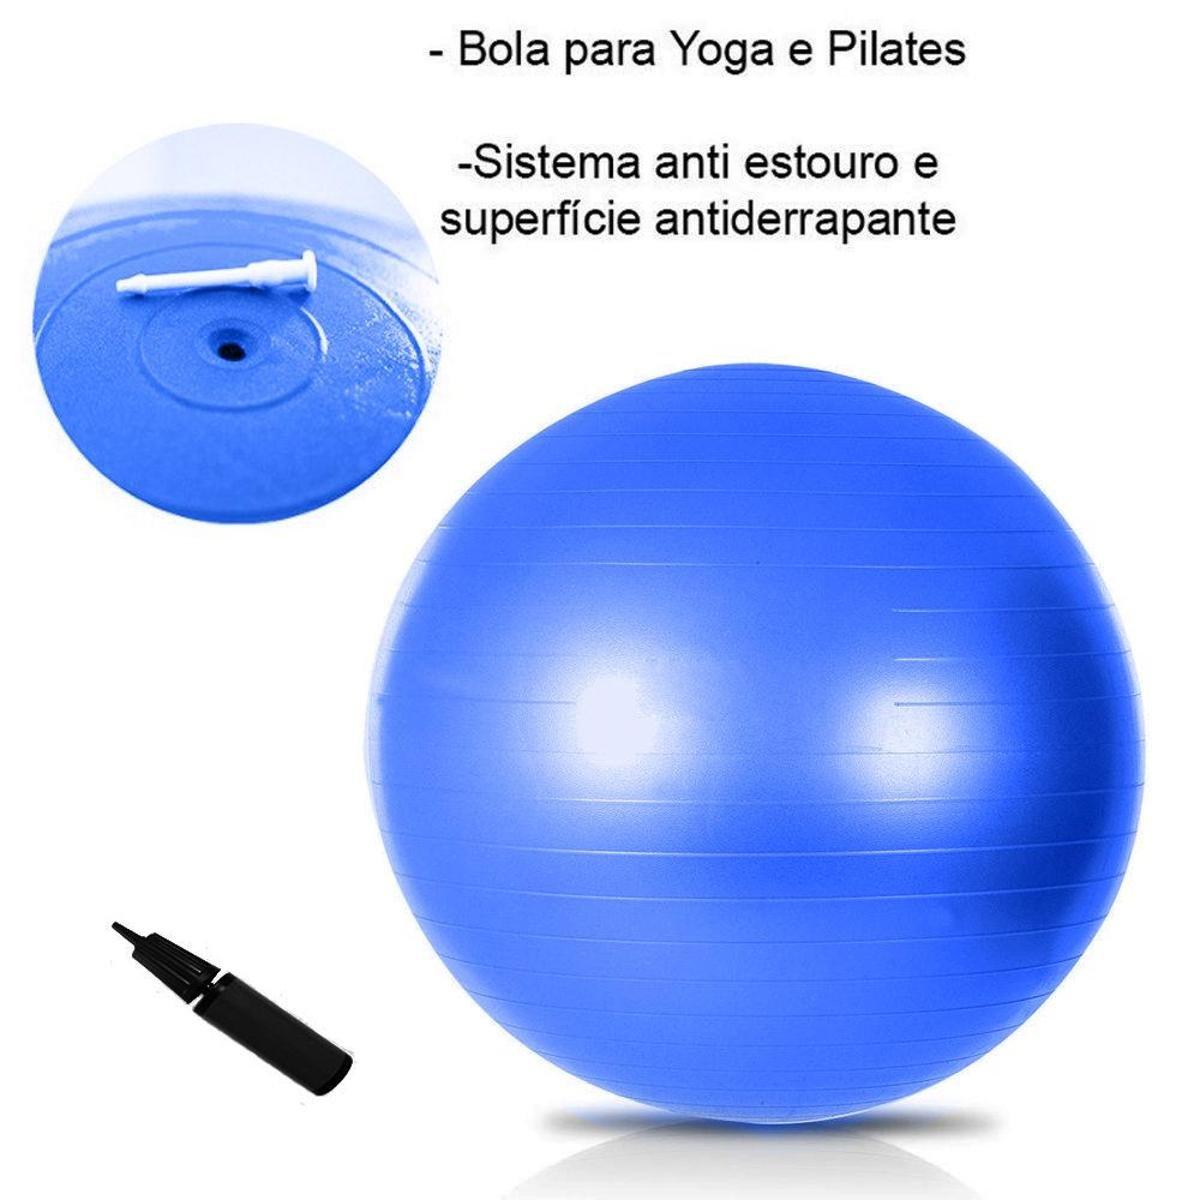 ... Bola Suíça Pilates 65 cm GymBall Ginástica Natural Fitness ... 5eeb1b691432b